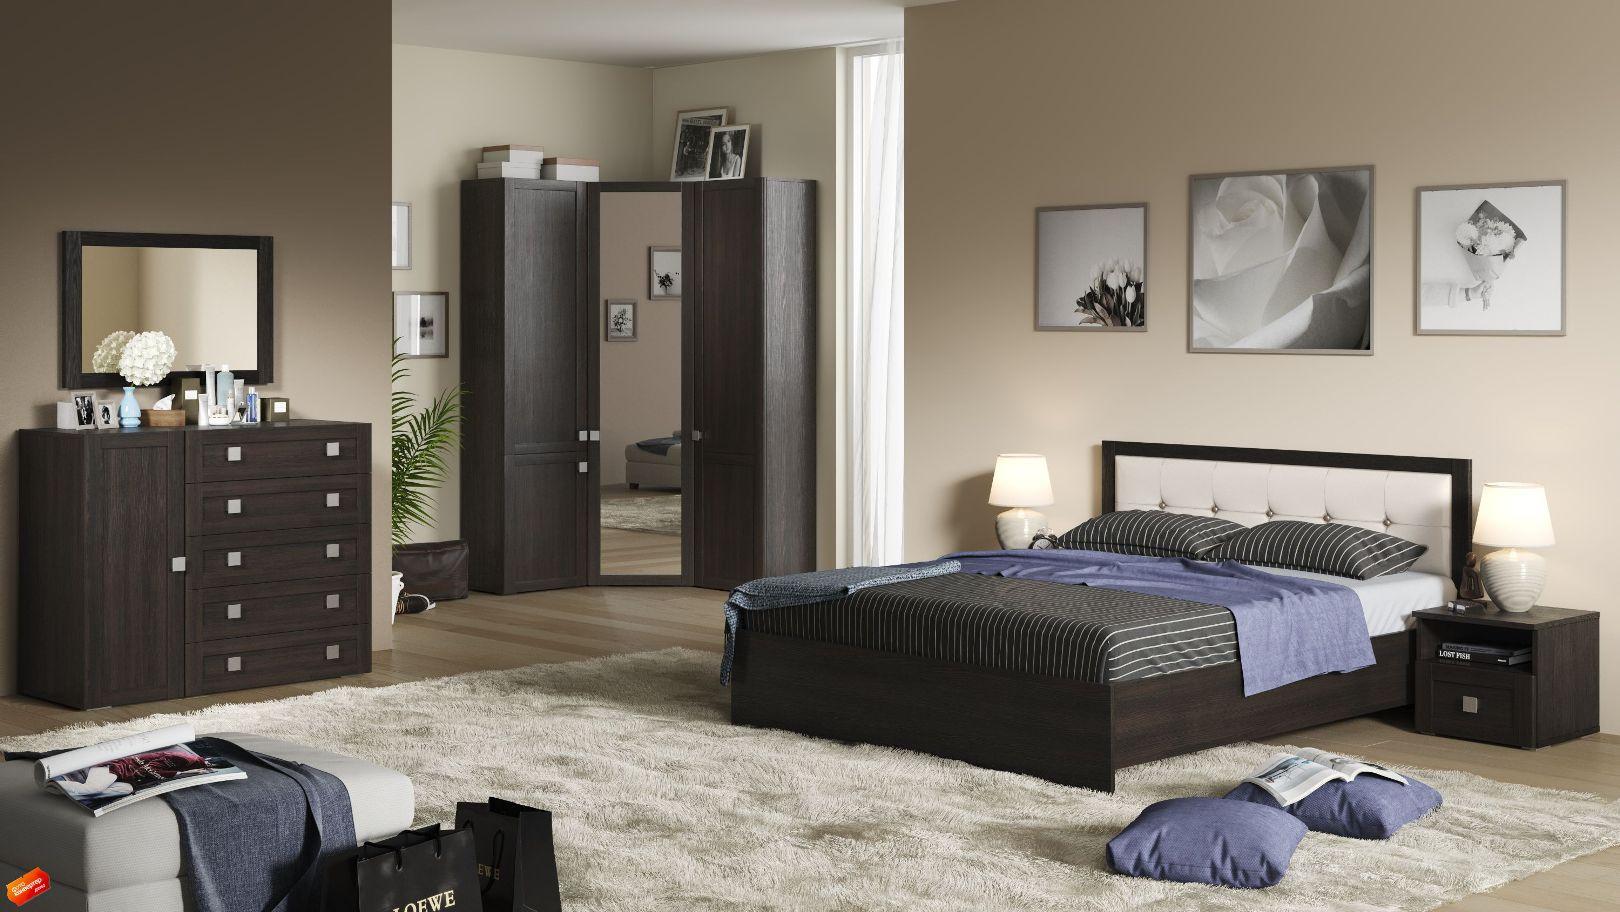 Модульная спальня Корсика Композиция-3 модульная спальня корсика композиция 1